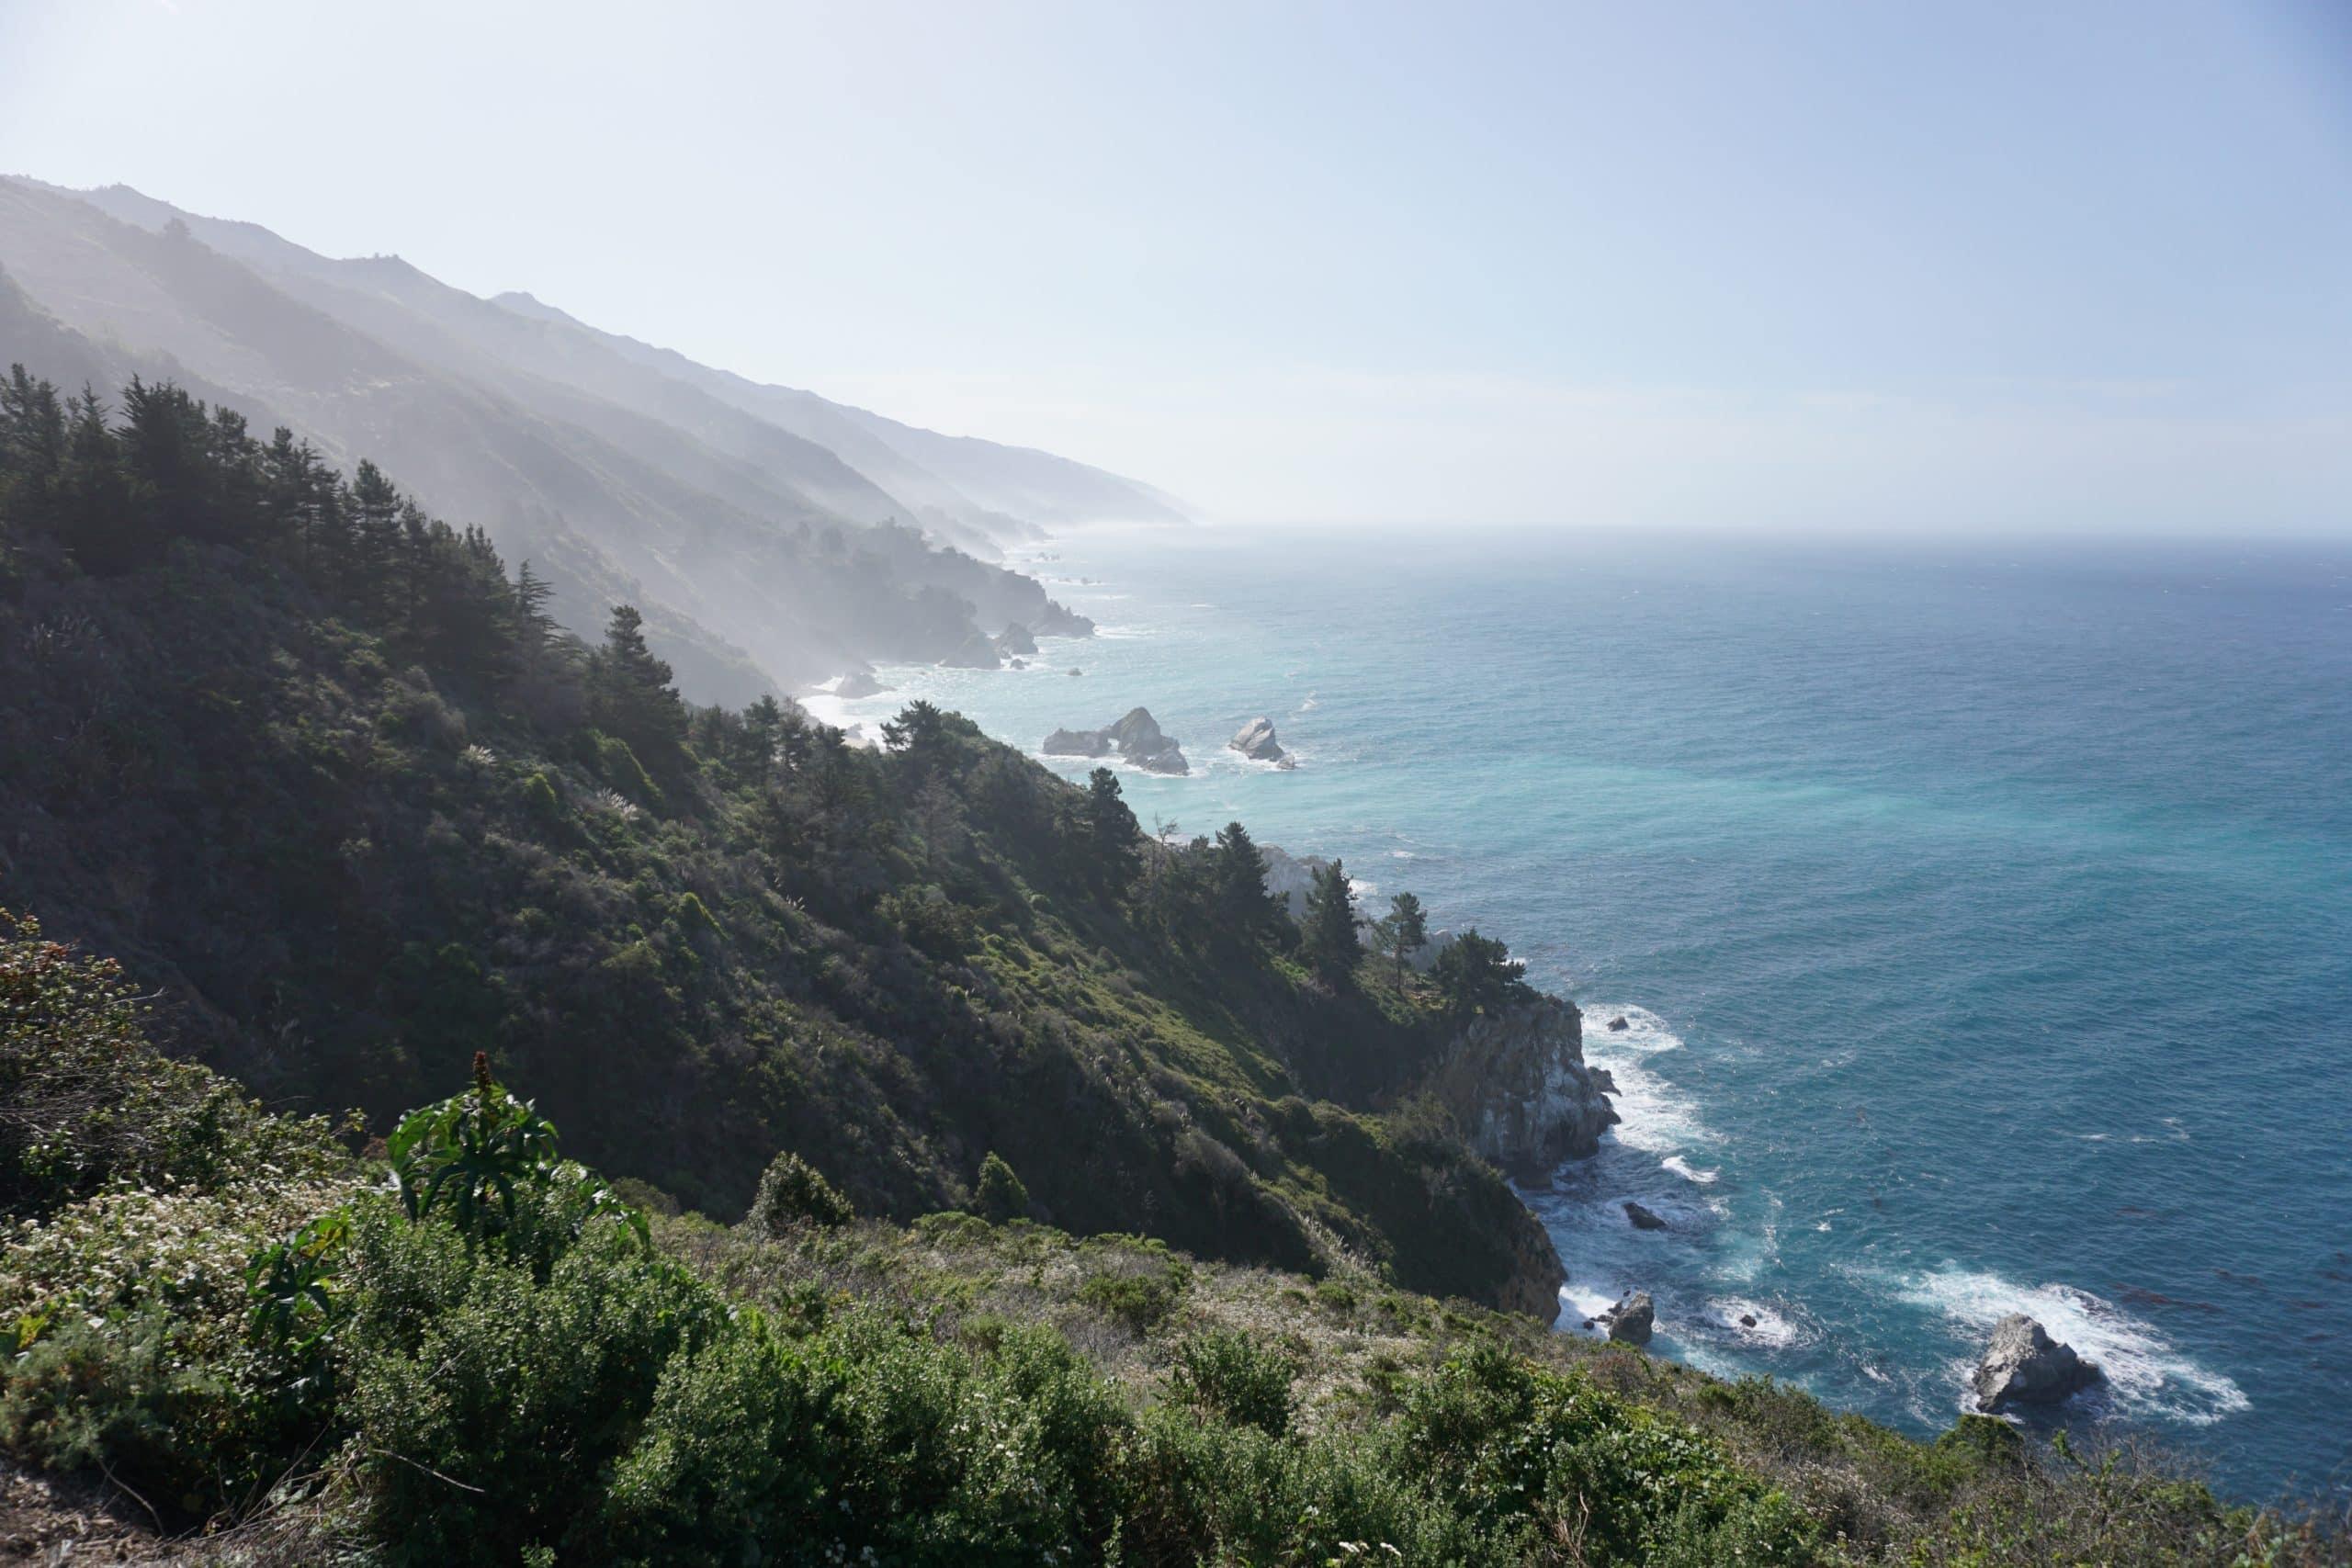 Big Sur cliffside in California